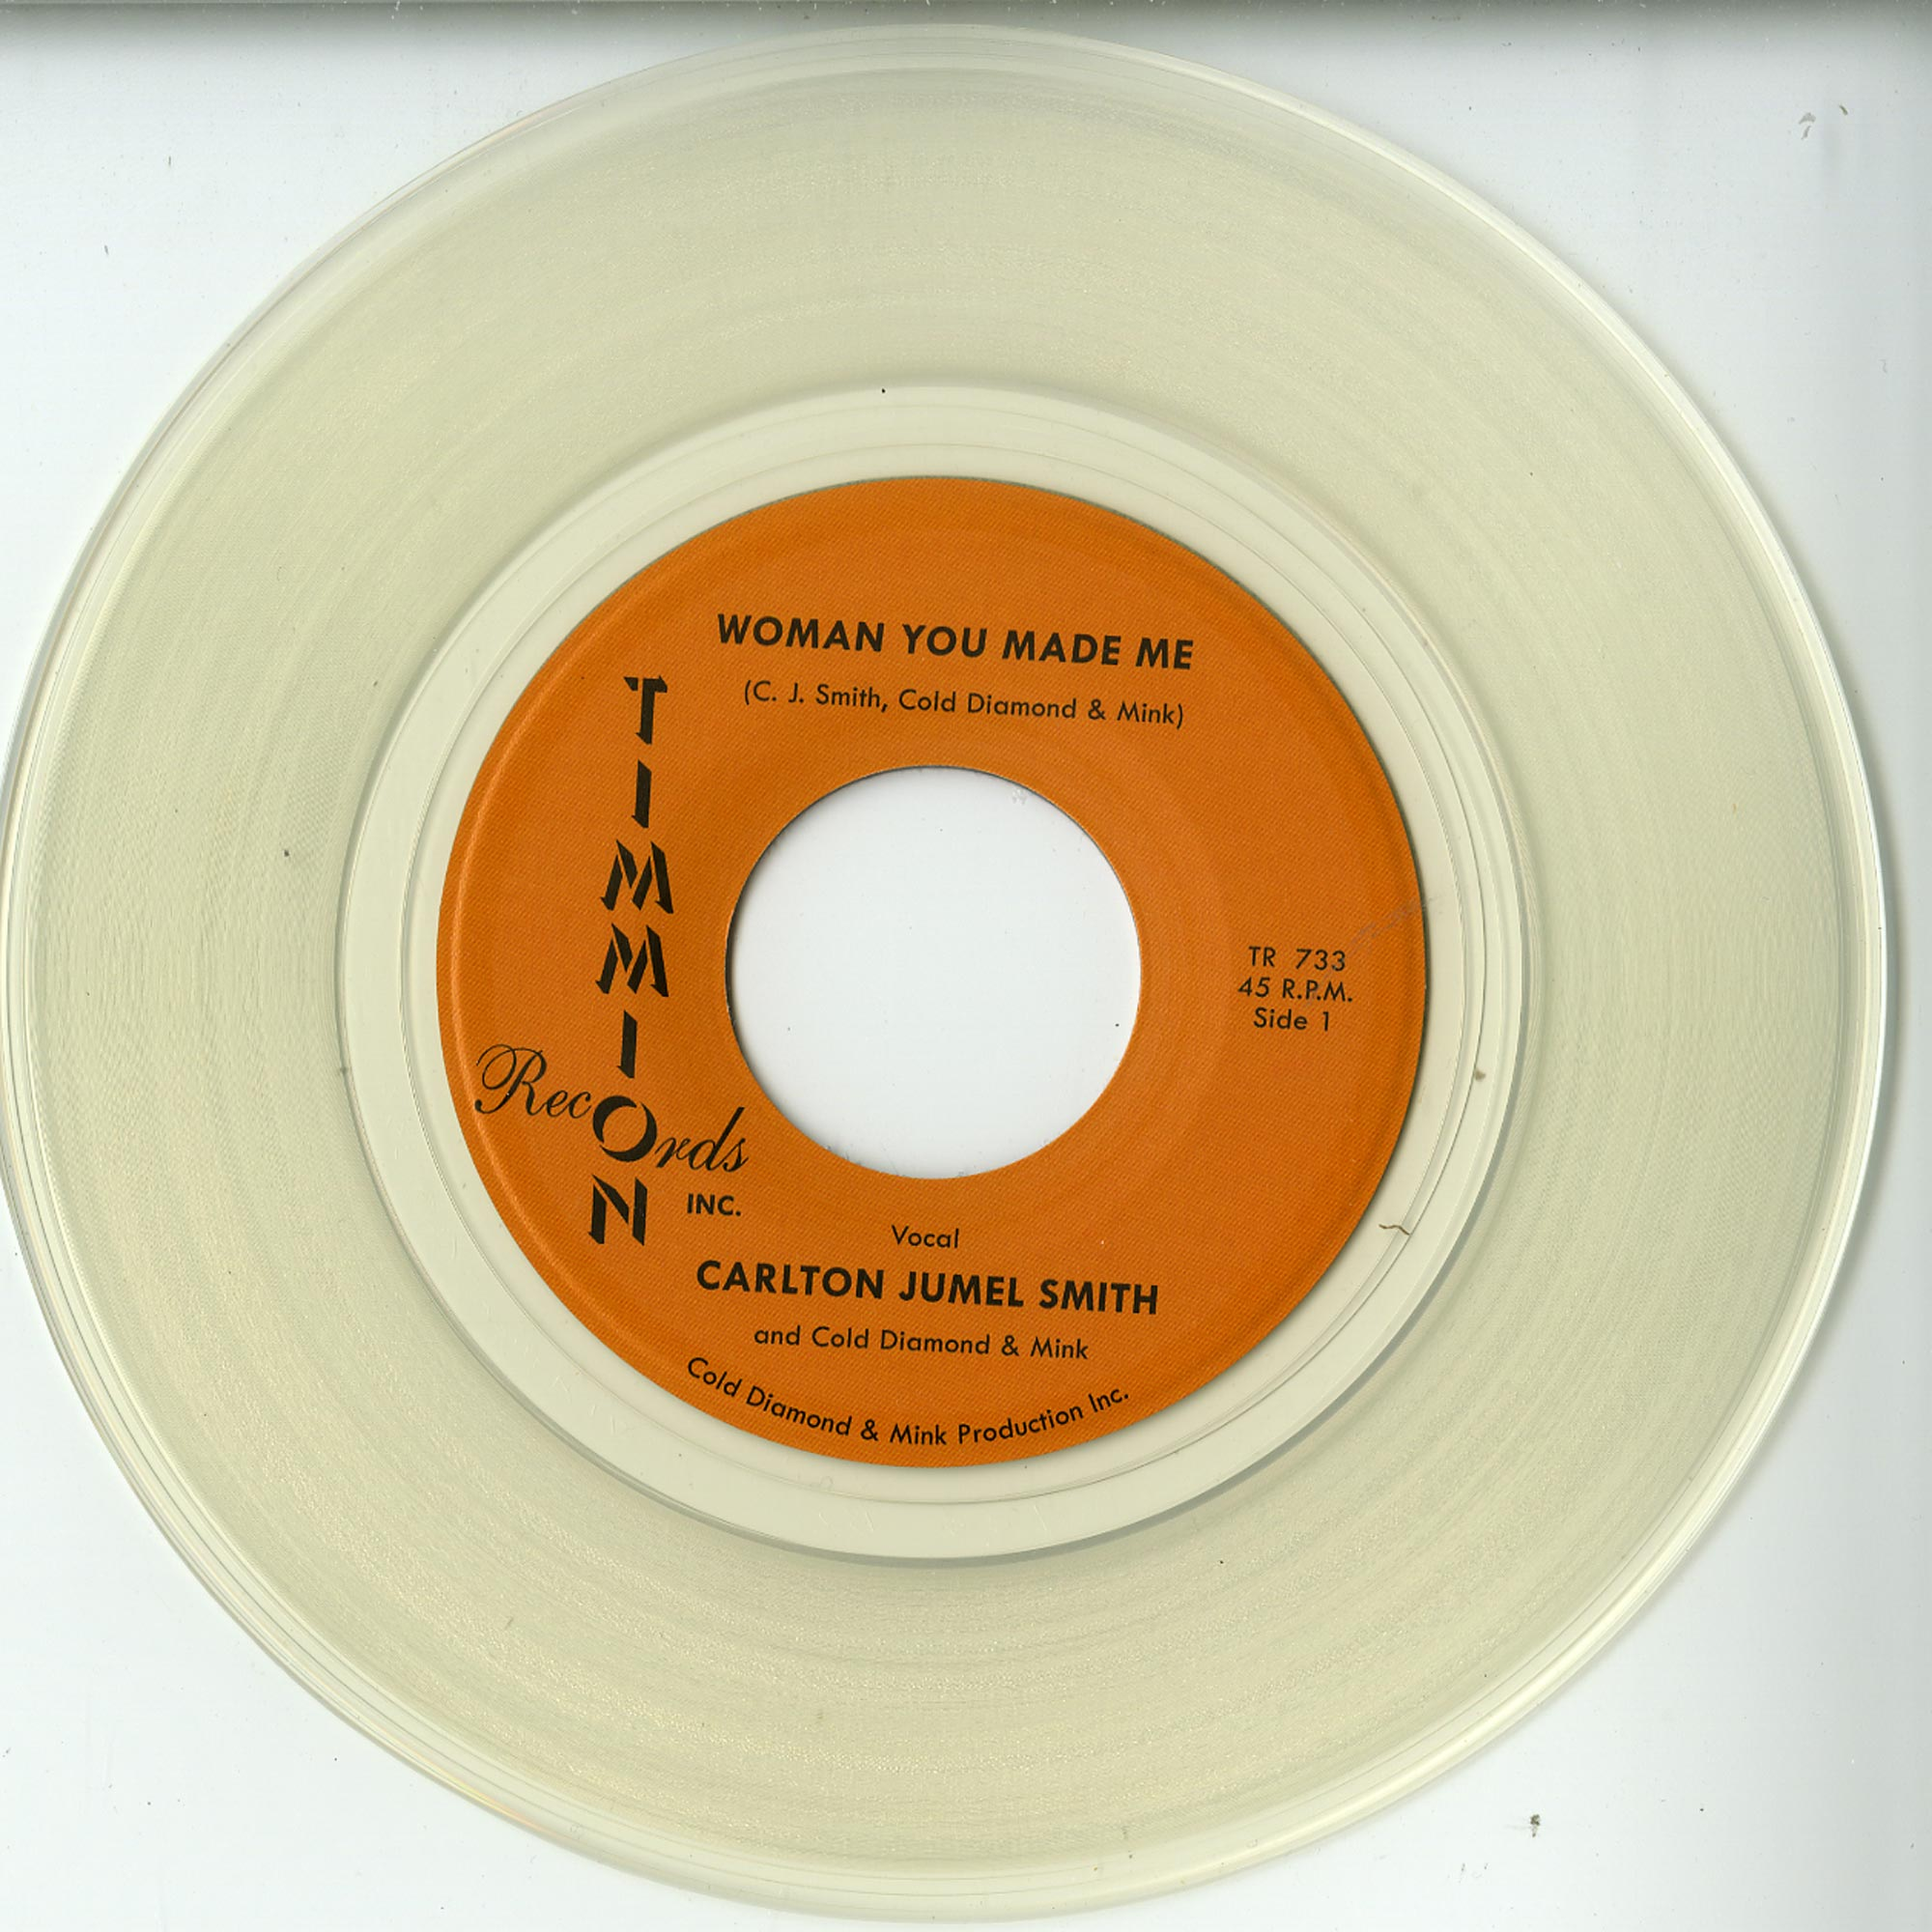 Carlton Jumel Smith with Cold Diamond & Mink - WOMAN YOU MADE ME